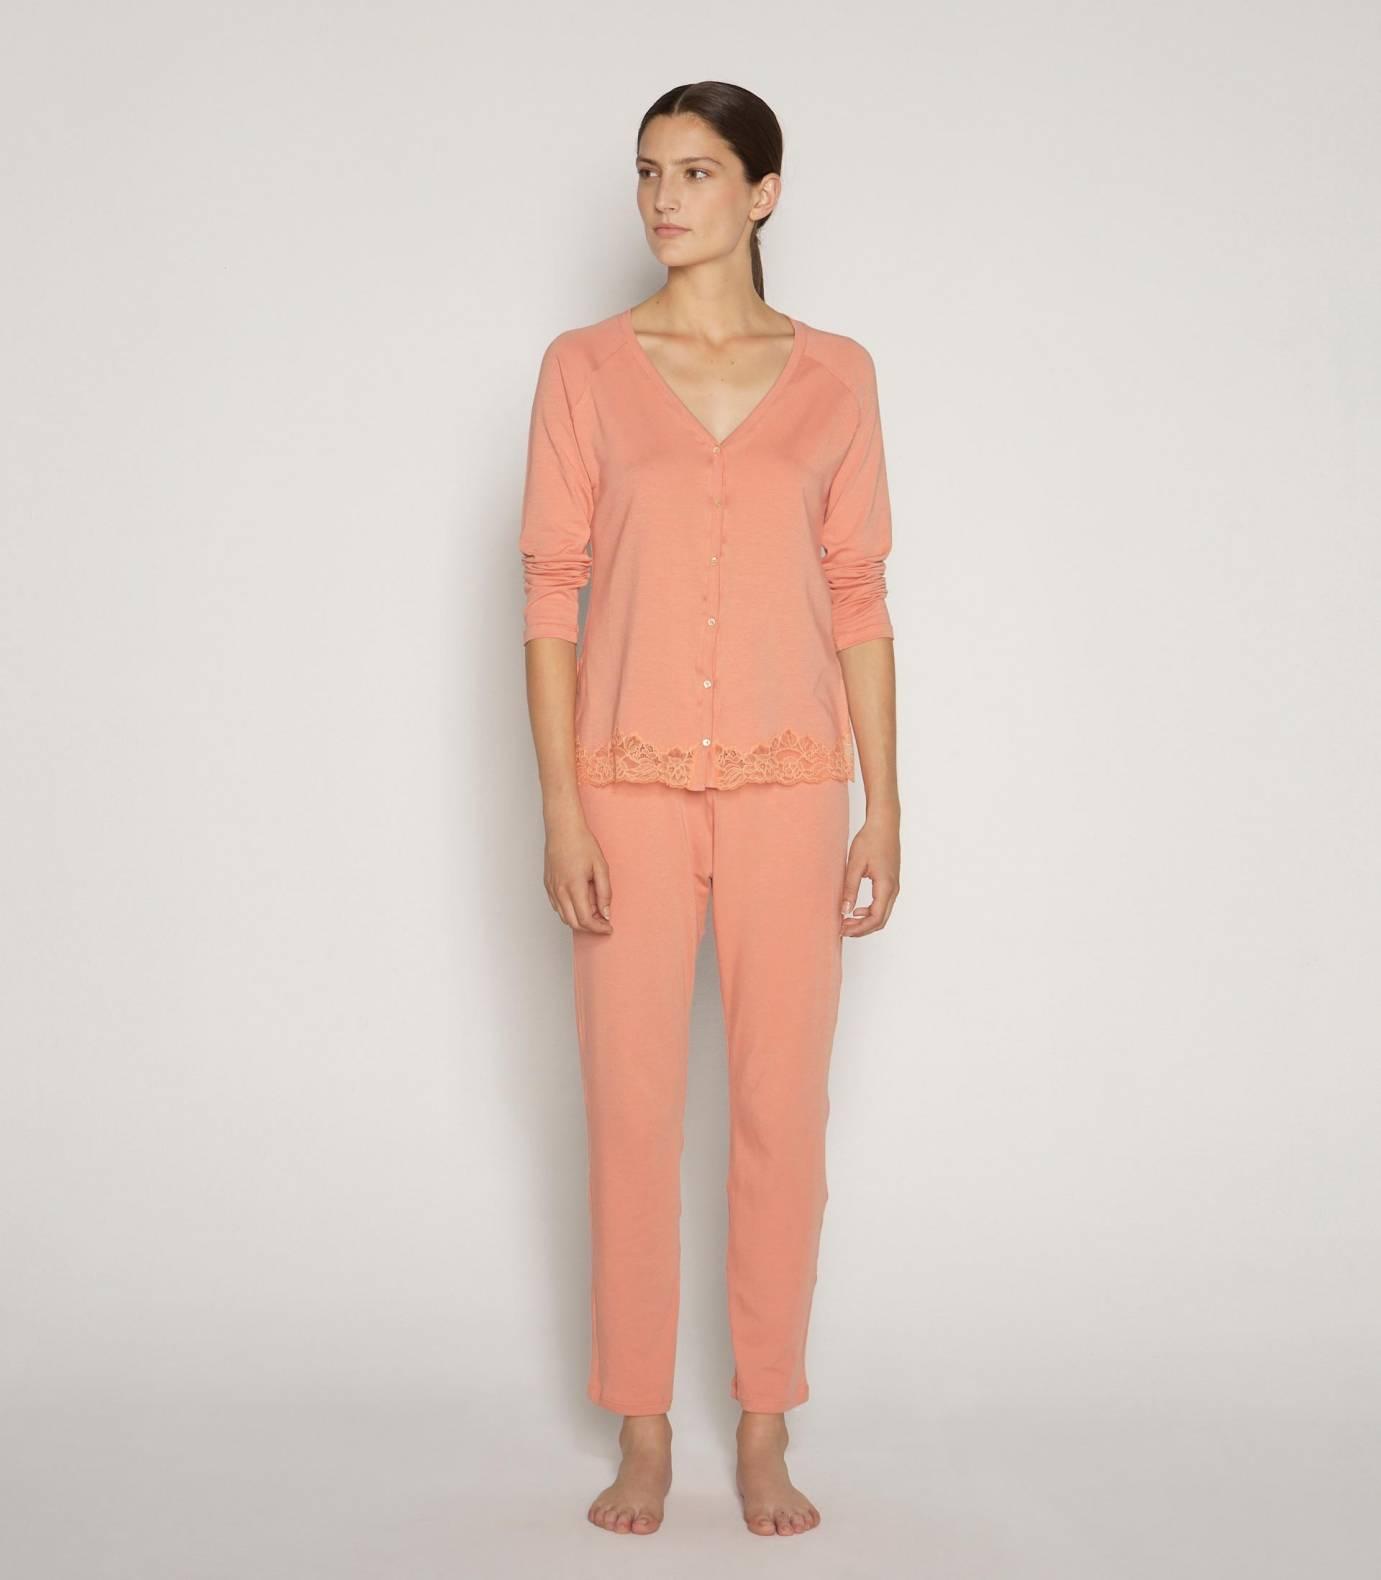 a270620c5 Cotton modal pyjamas - TCN